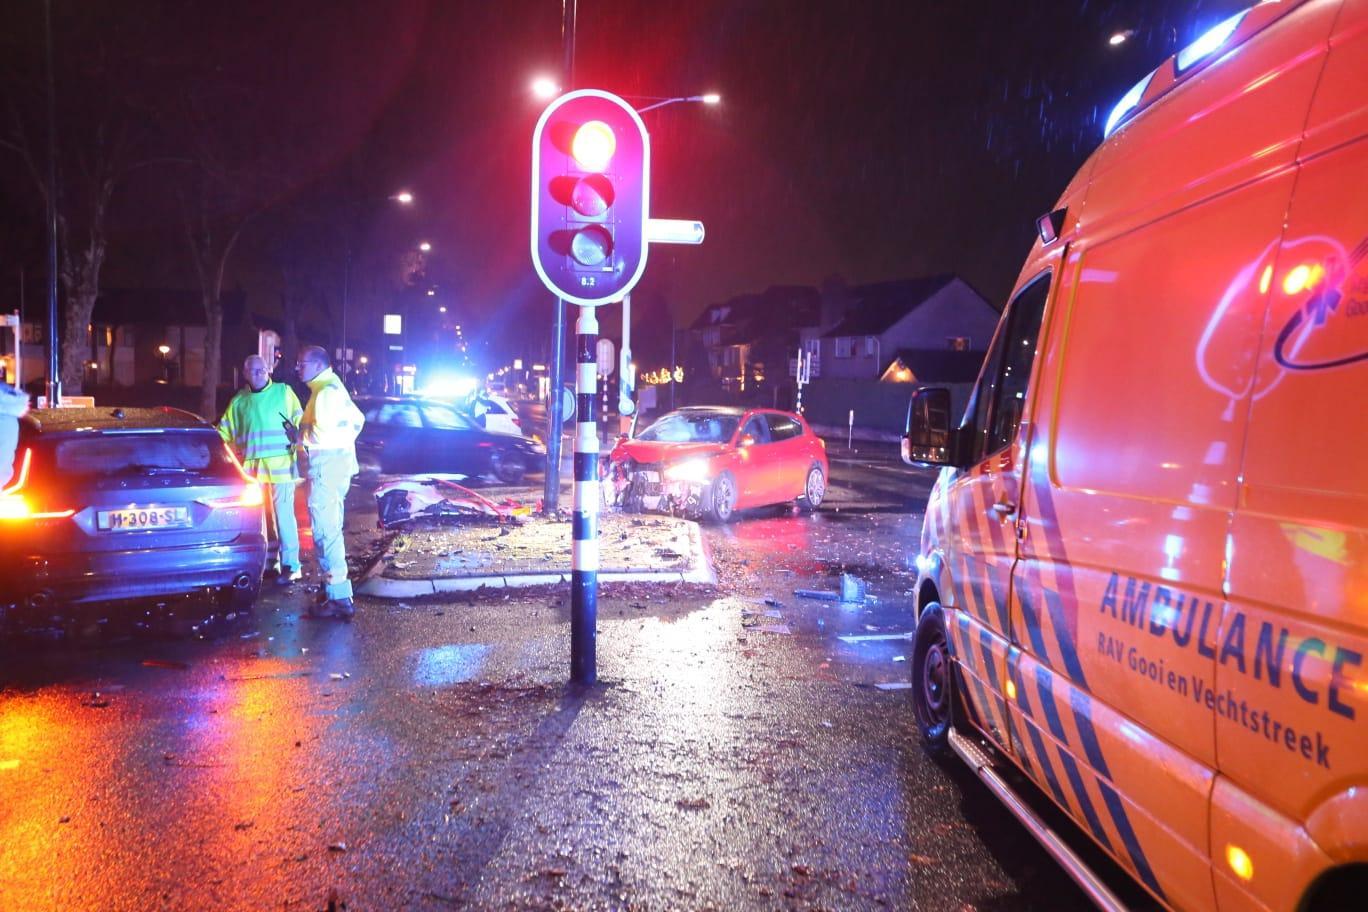 Zwaar ongeluk in Huizen: één persoon ernstig gewond, drie 'licht' [update]